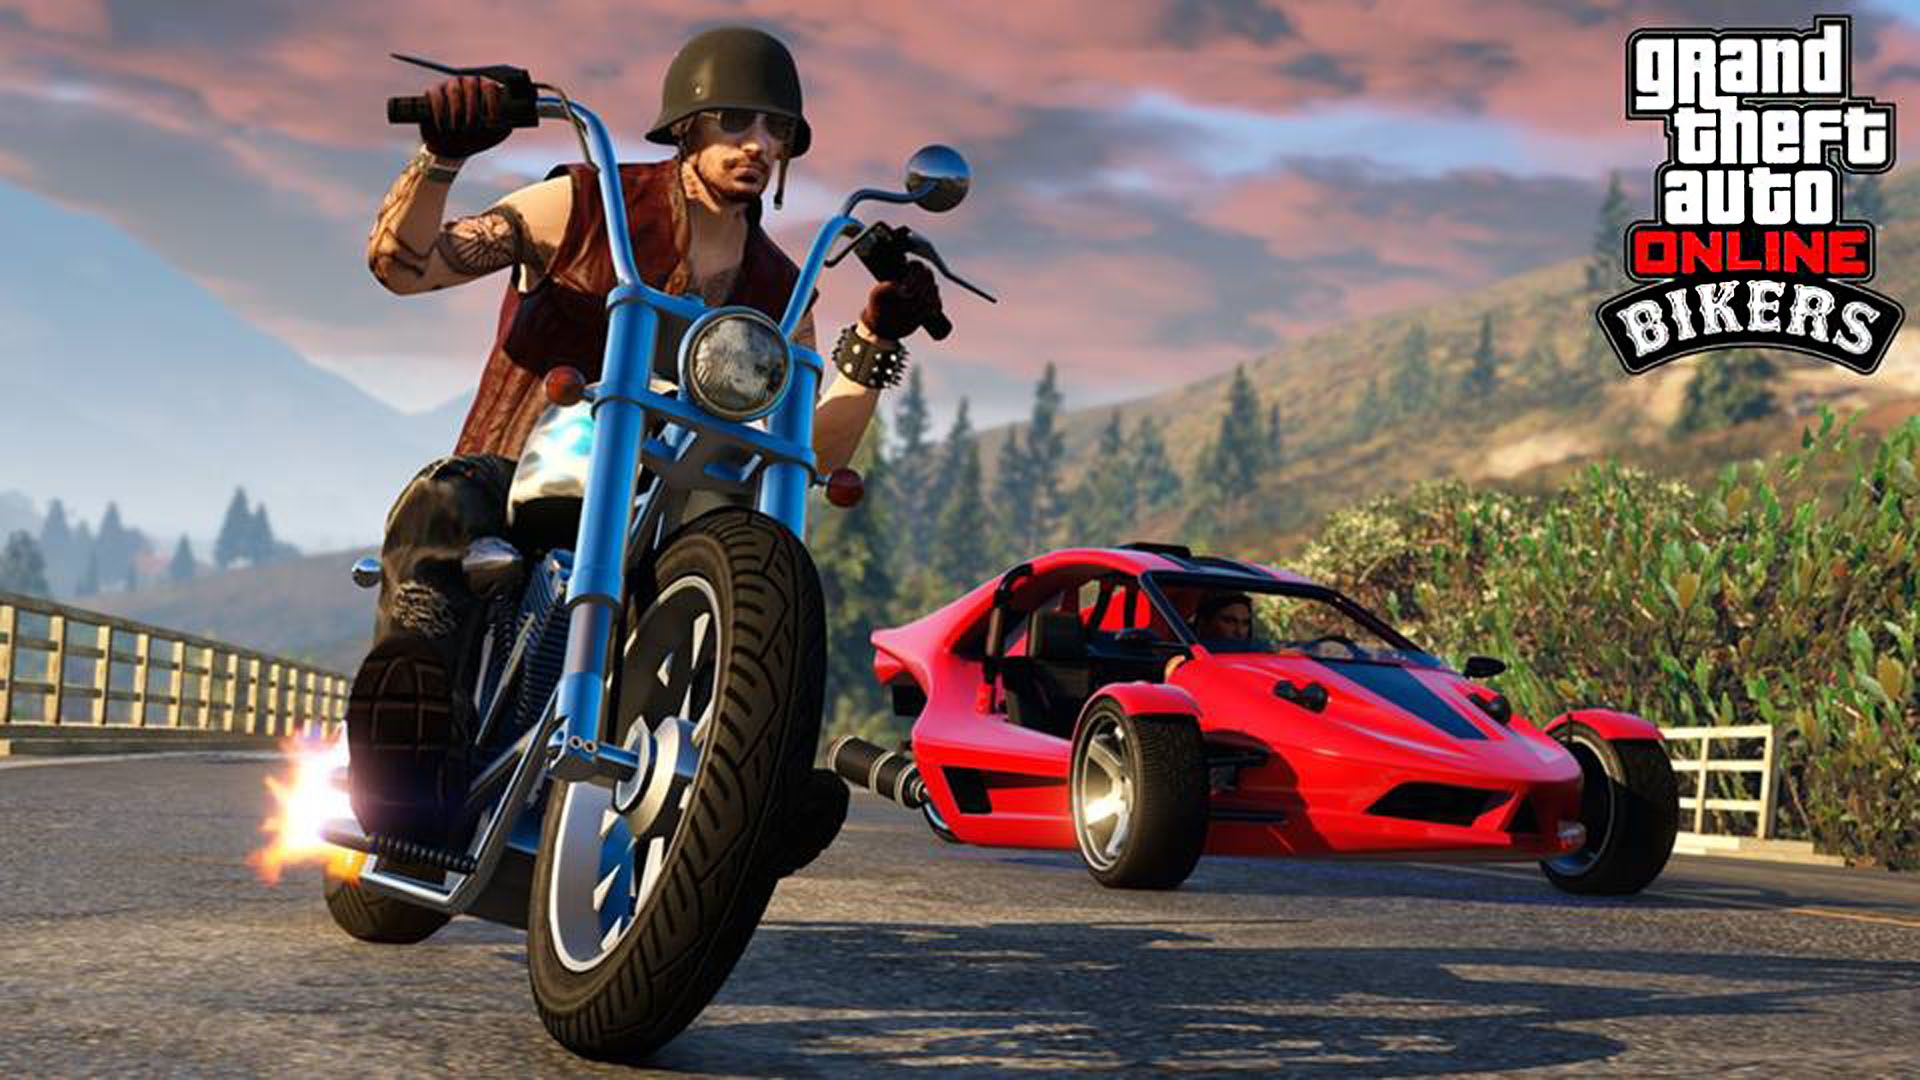 Western Daemon Bf Raptor Gta 5 Online Bikers Dlc 1920x1080 Wallpaper Grand Theft Auto Jeux Video Jeux